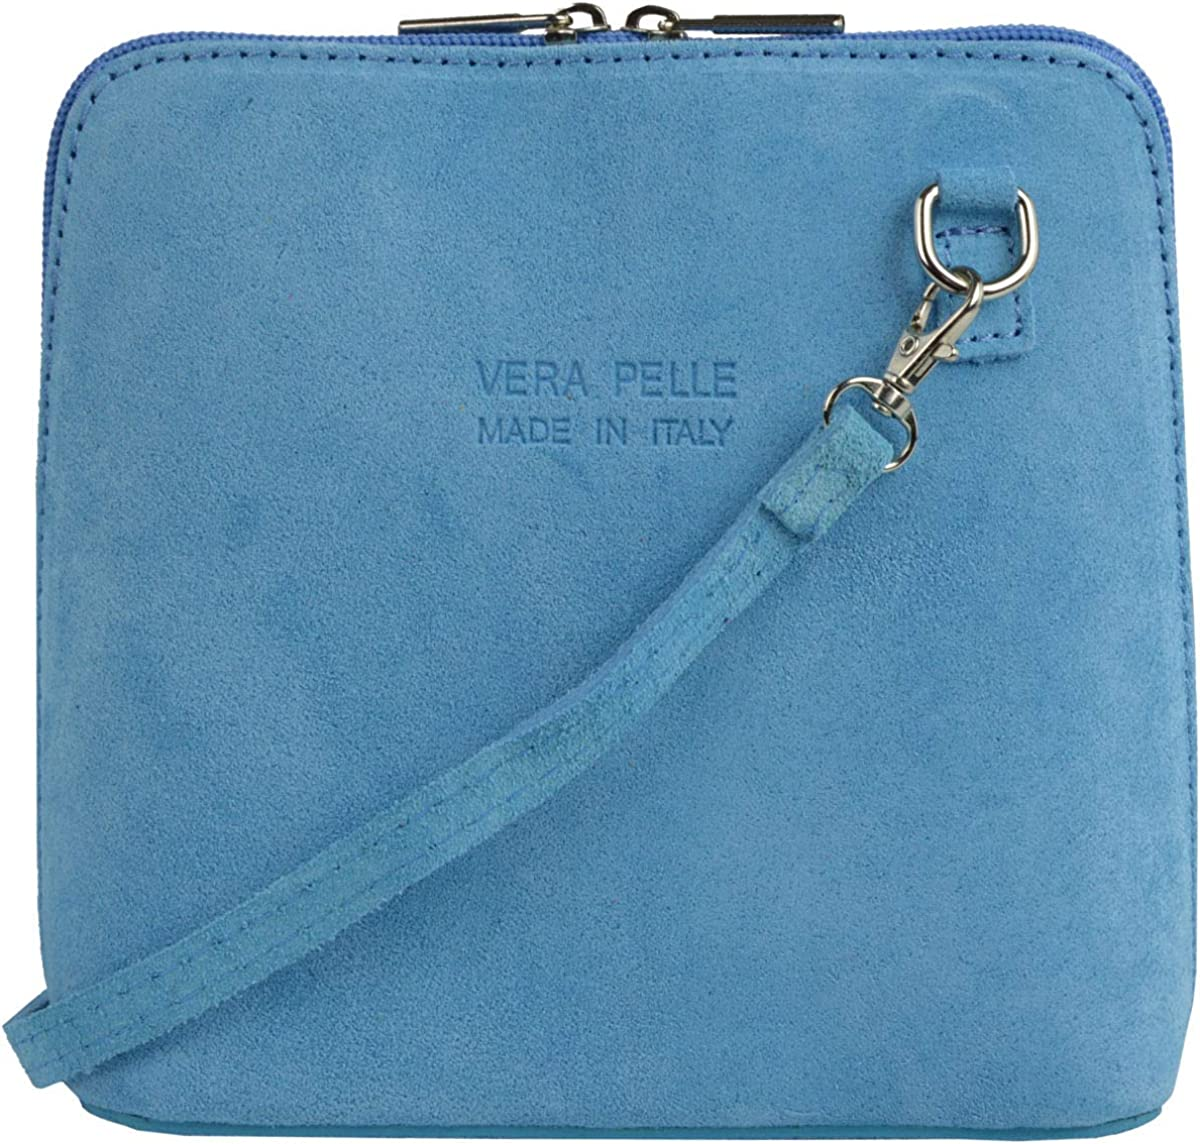 Small Shoulder Bag in 18 Colors Womens Italian Suede Leather Cross Body Handbag